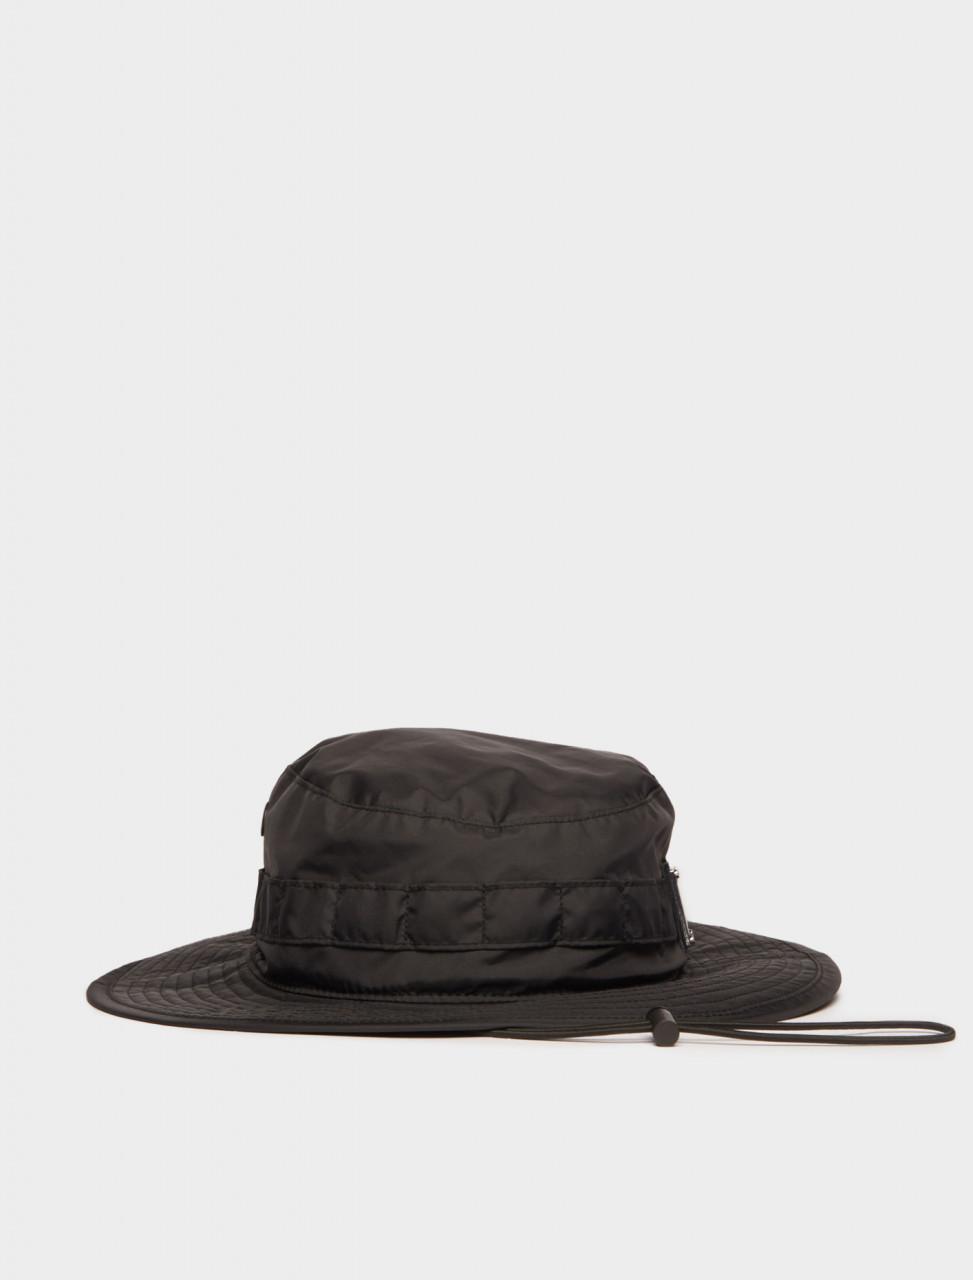 110-C40099-900 ACNE STUDIOS FACE PLAQUE BUCKET HAT IN BLACK